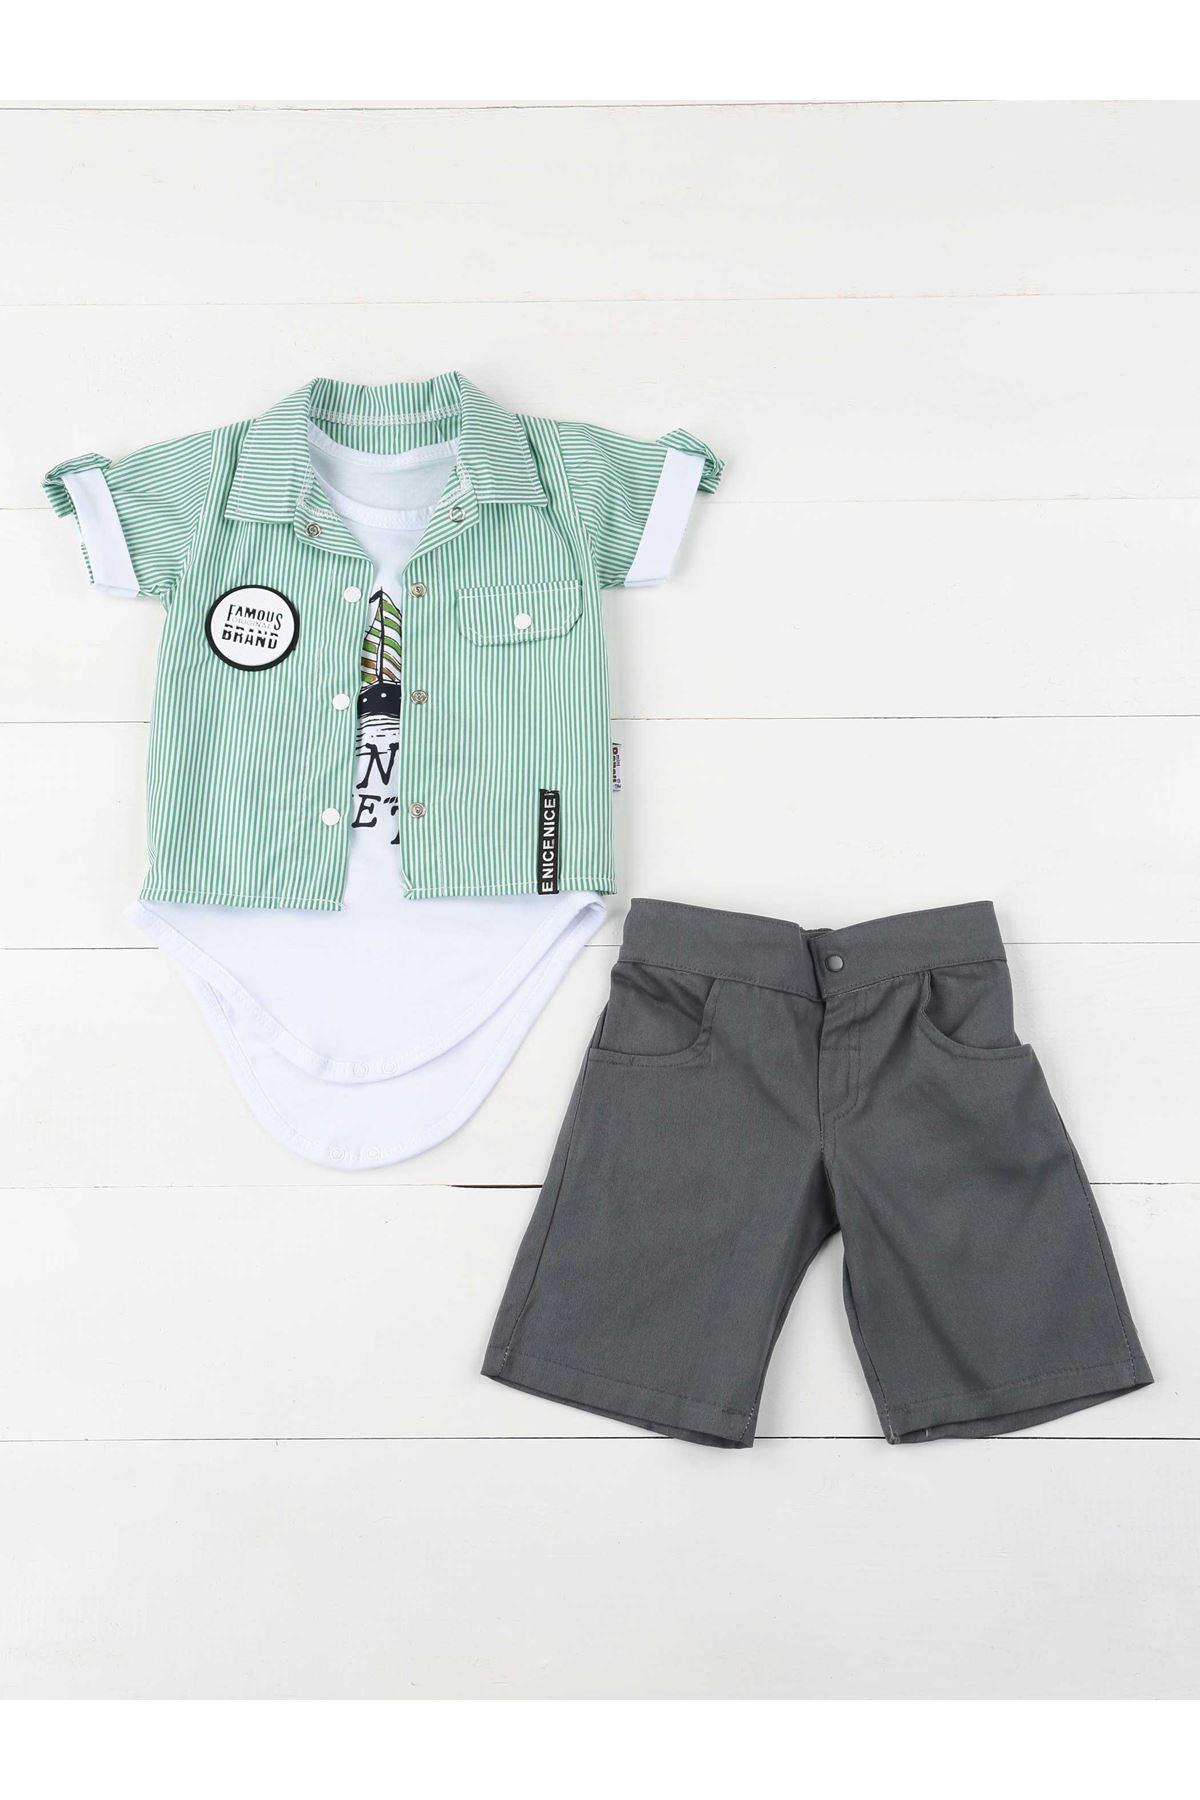 Green Smoked Summer Baby Boy PCs Set Suit